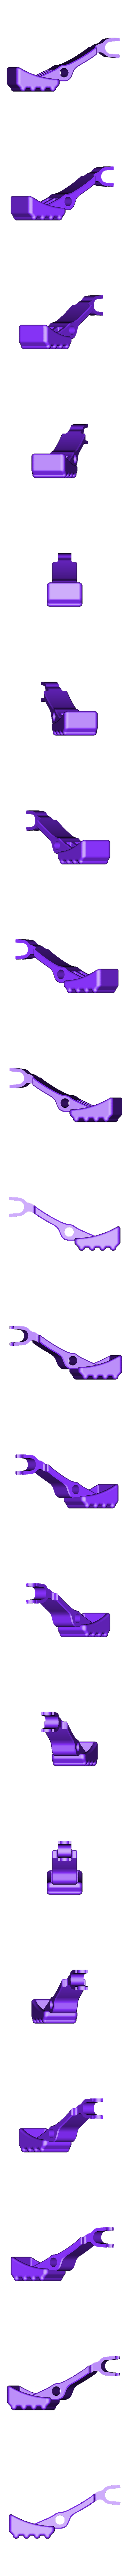 bouton_1.stl Download free STL file Meter Dexter trigger back • 3D printing model, floun